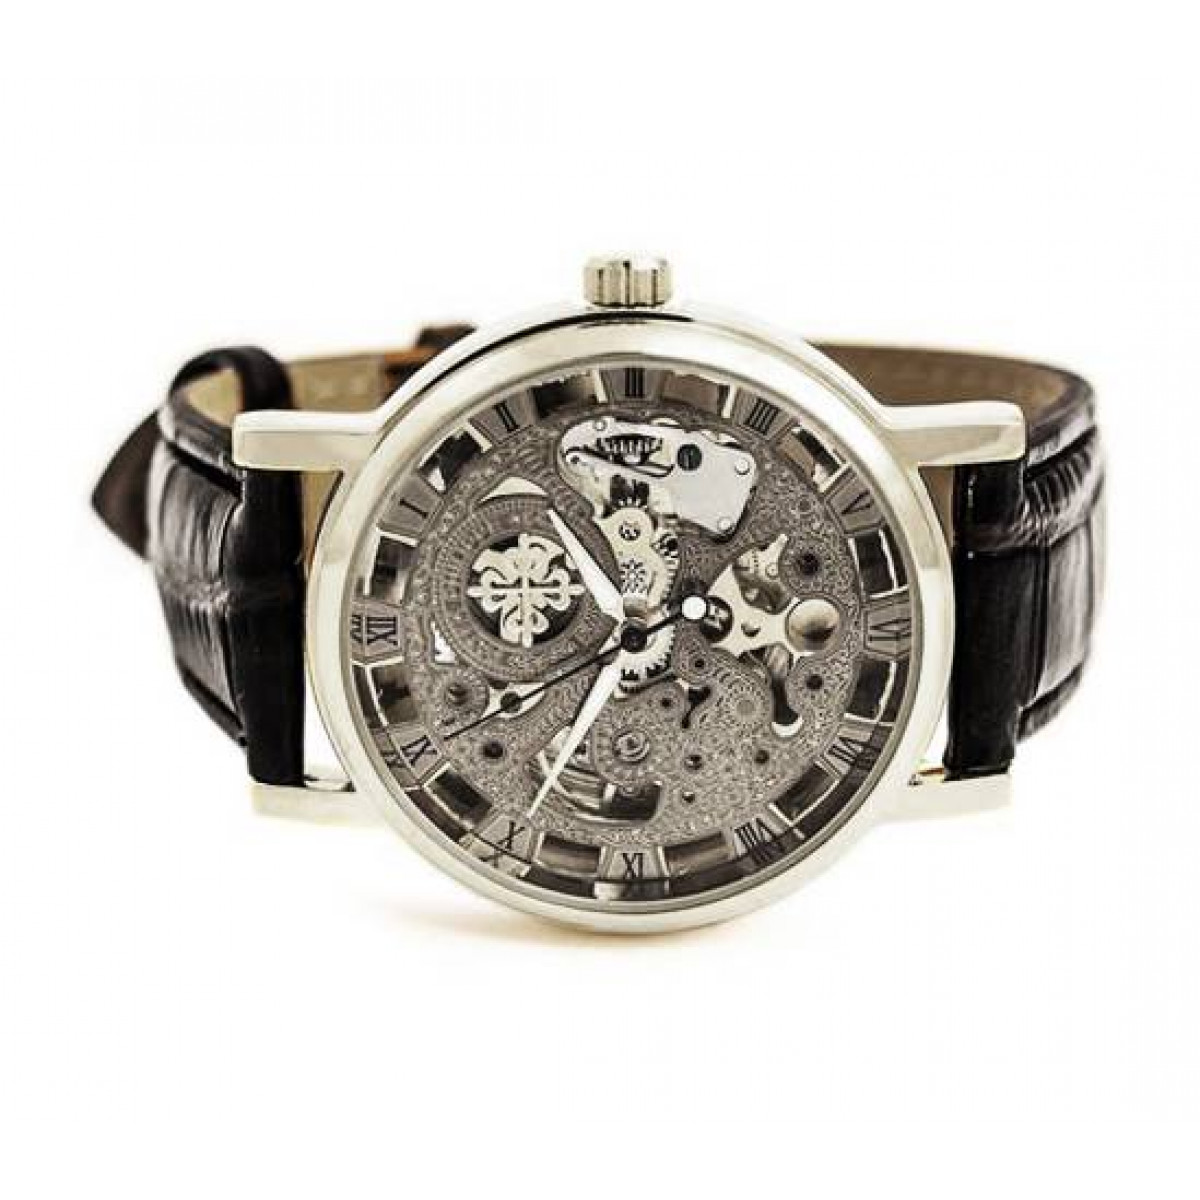 8d61c8ae Купить часы Скелетон (реплика Patek Philippe) Silver